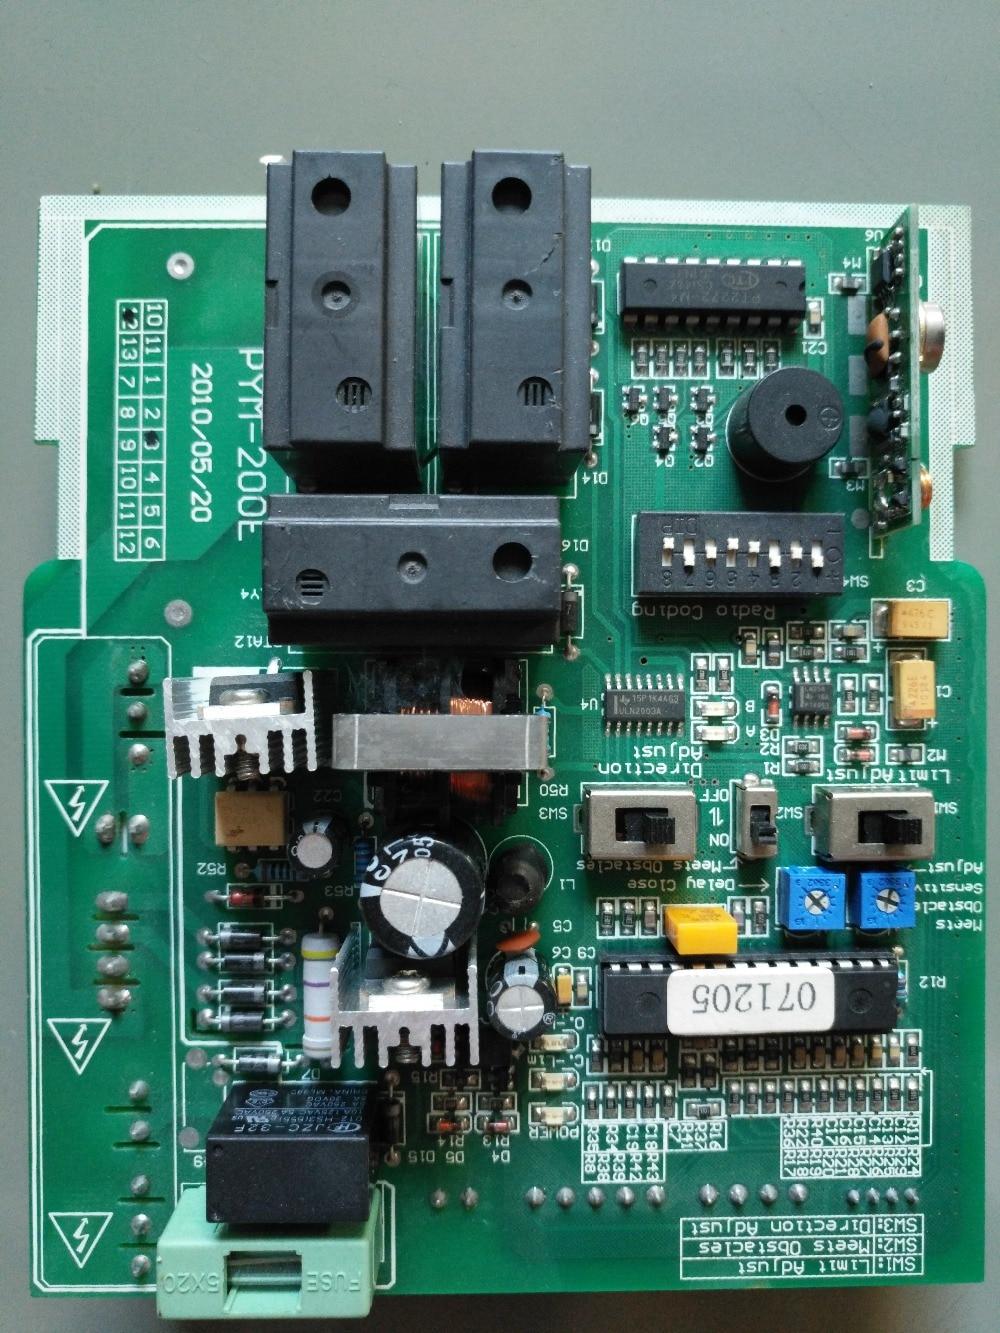 4 000 Pound Gate Opener Circuit Board Py1800 Sliding Gate